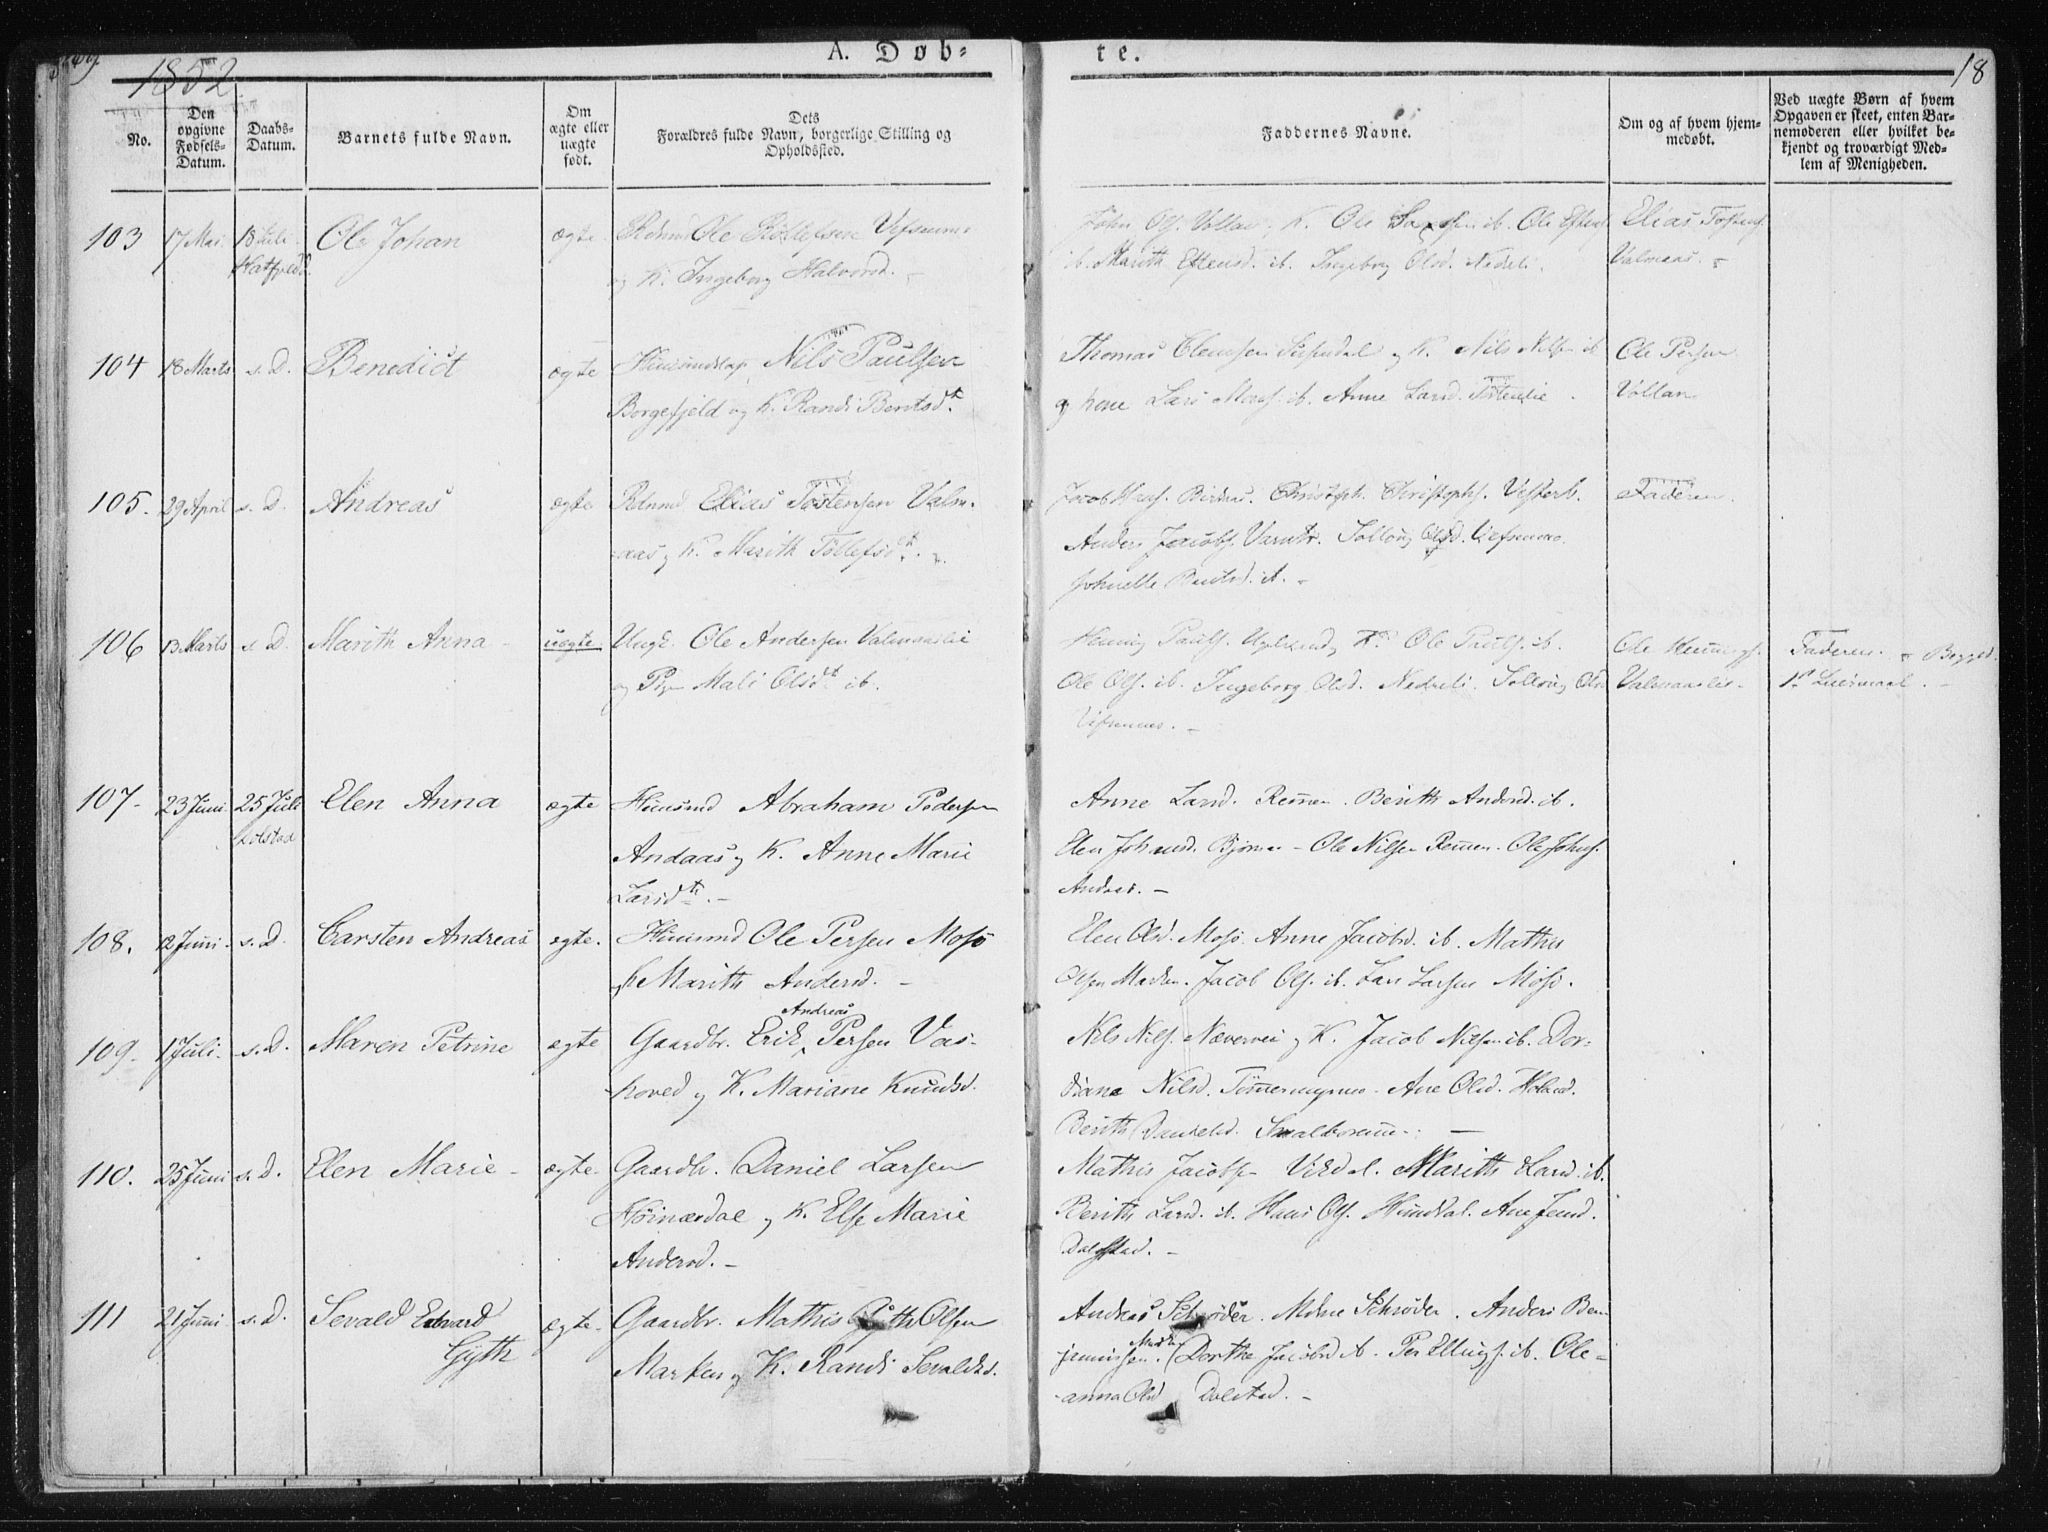 SAT, Ministerialprotokoller, klokkerbøker og fødselsregistre - Nordland, 820/L0292: Ministerialbok nr. 820A13, 1851-1854, s. 18